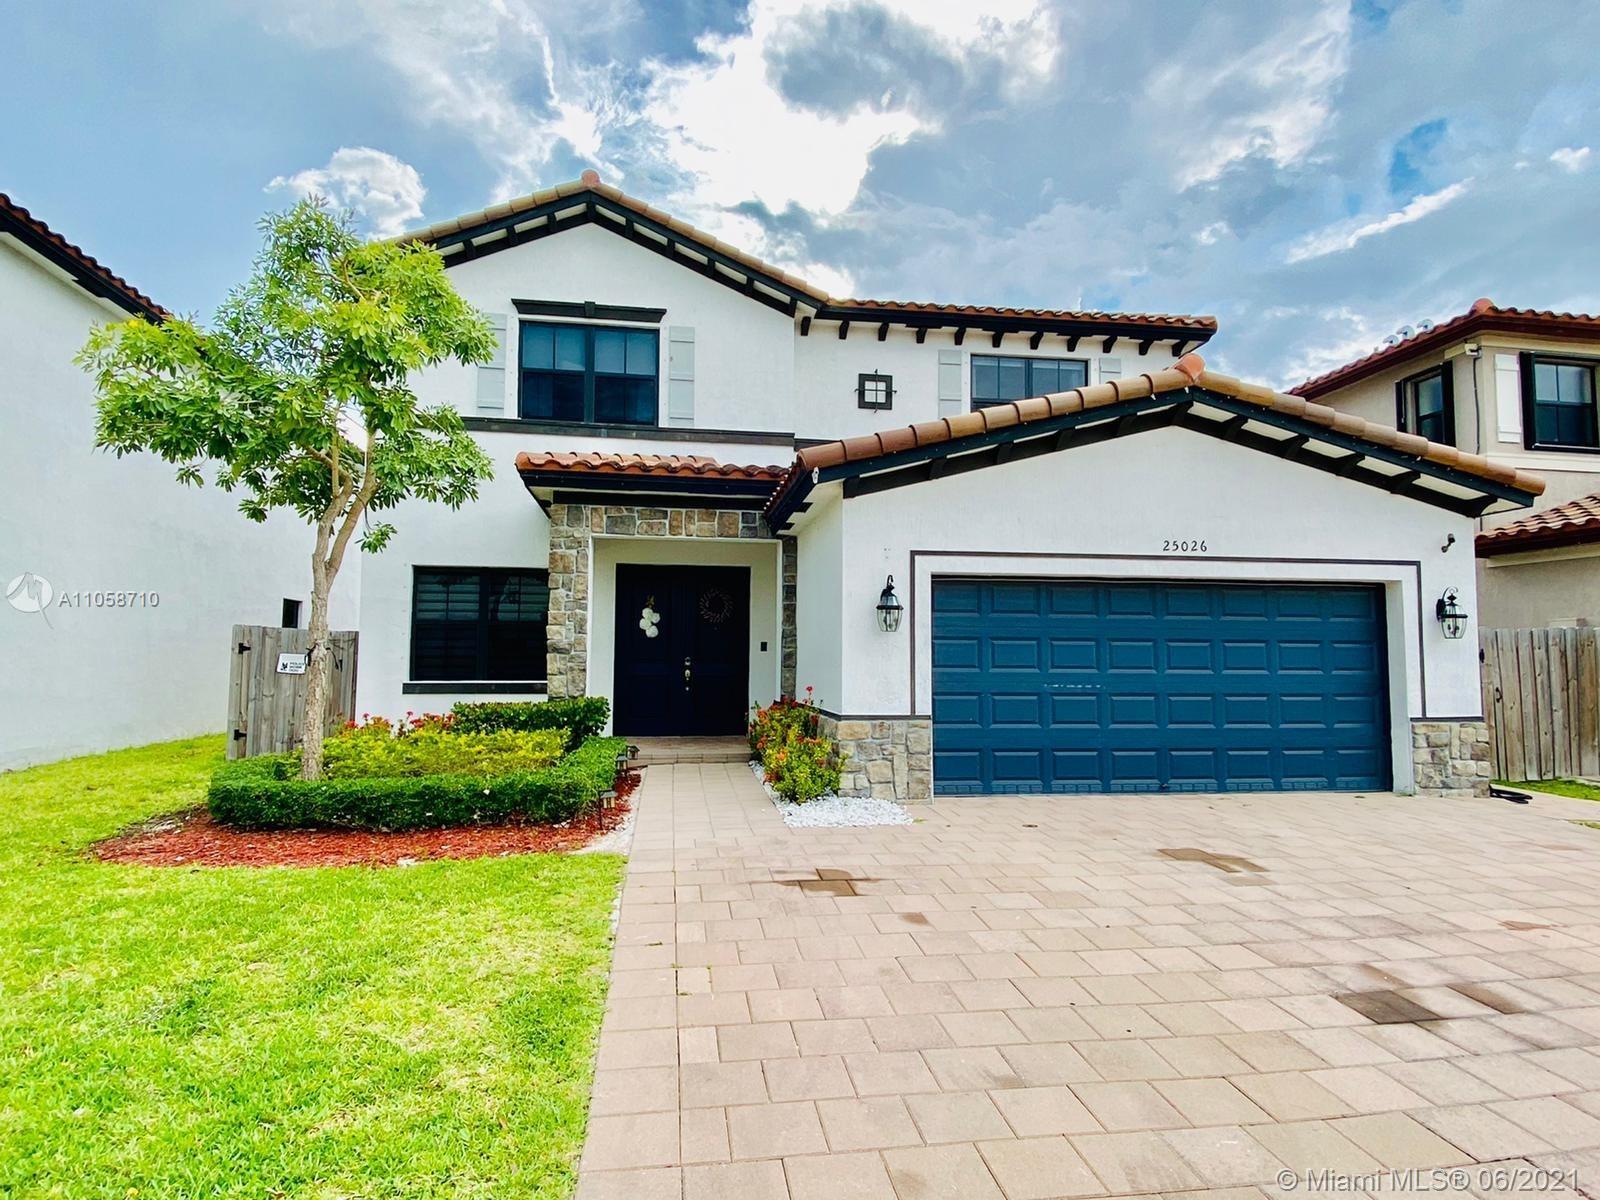 25026 Sw 118 Ave Property Photo 1